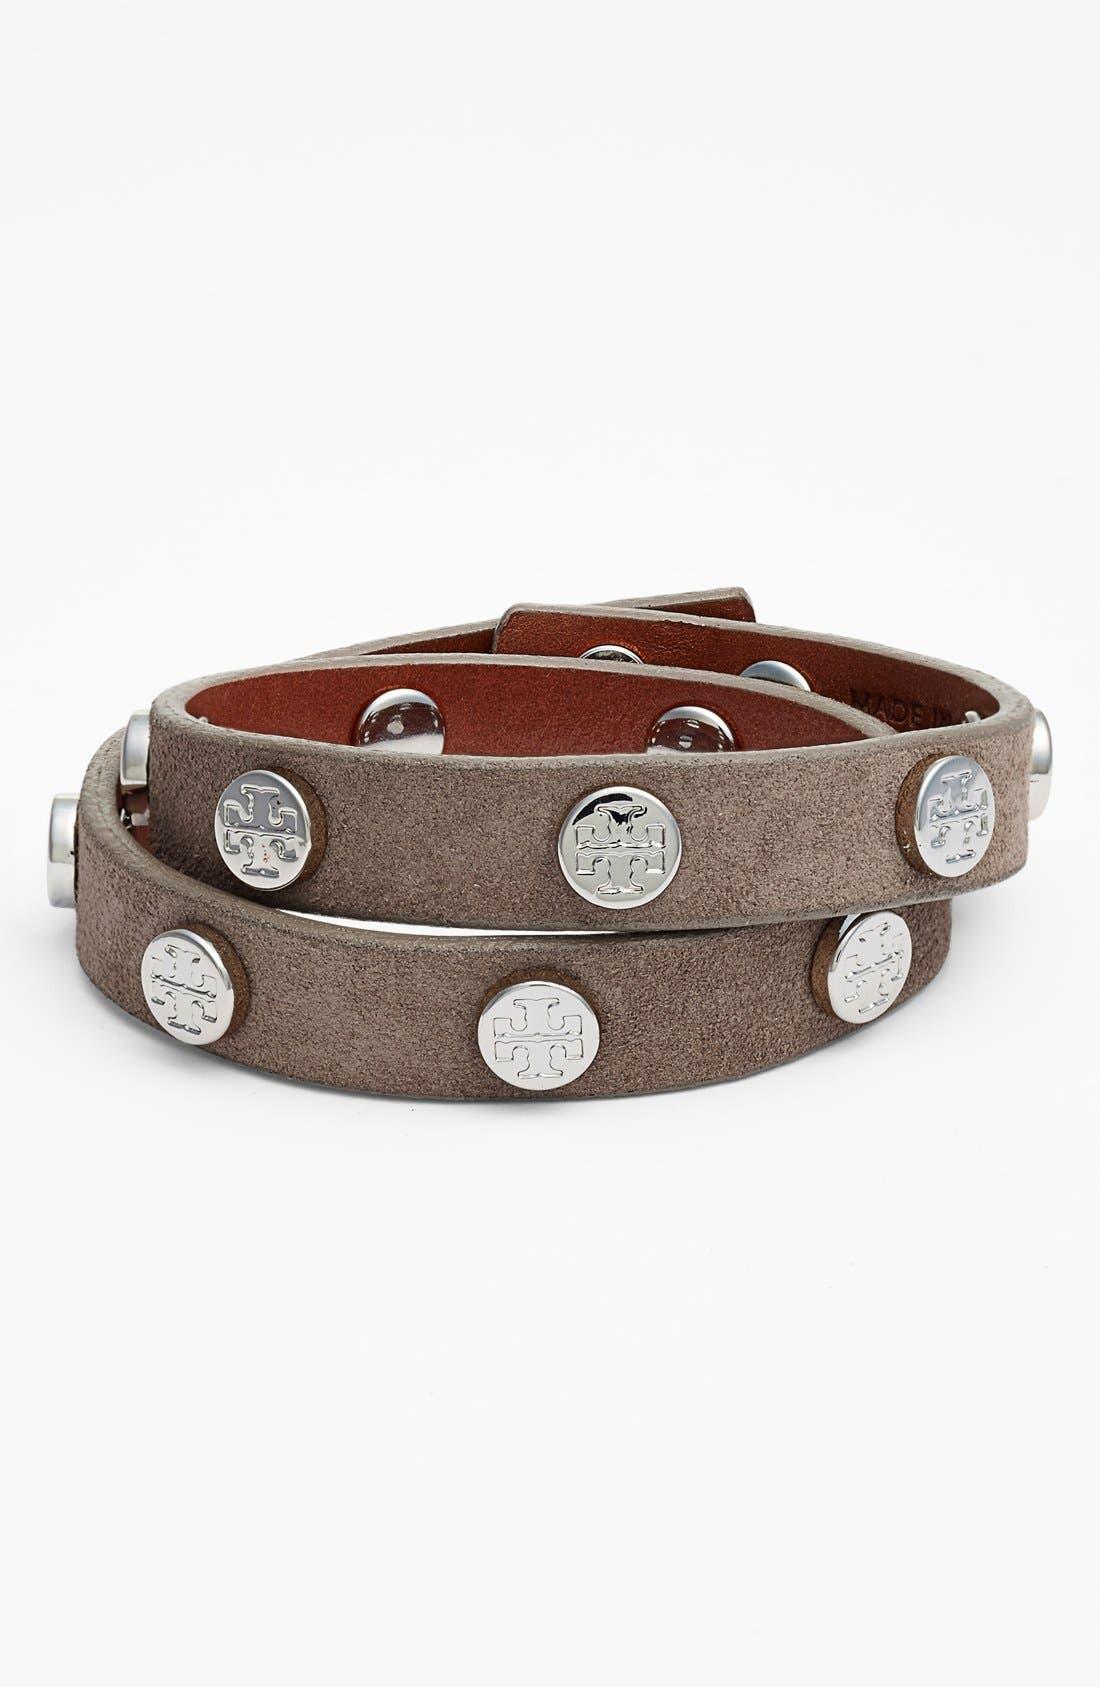 TORY BURCH,                             Logo Leather Wrap Bracelet,                             Main thumbnail 1, color,                             200